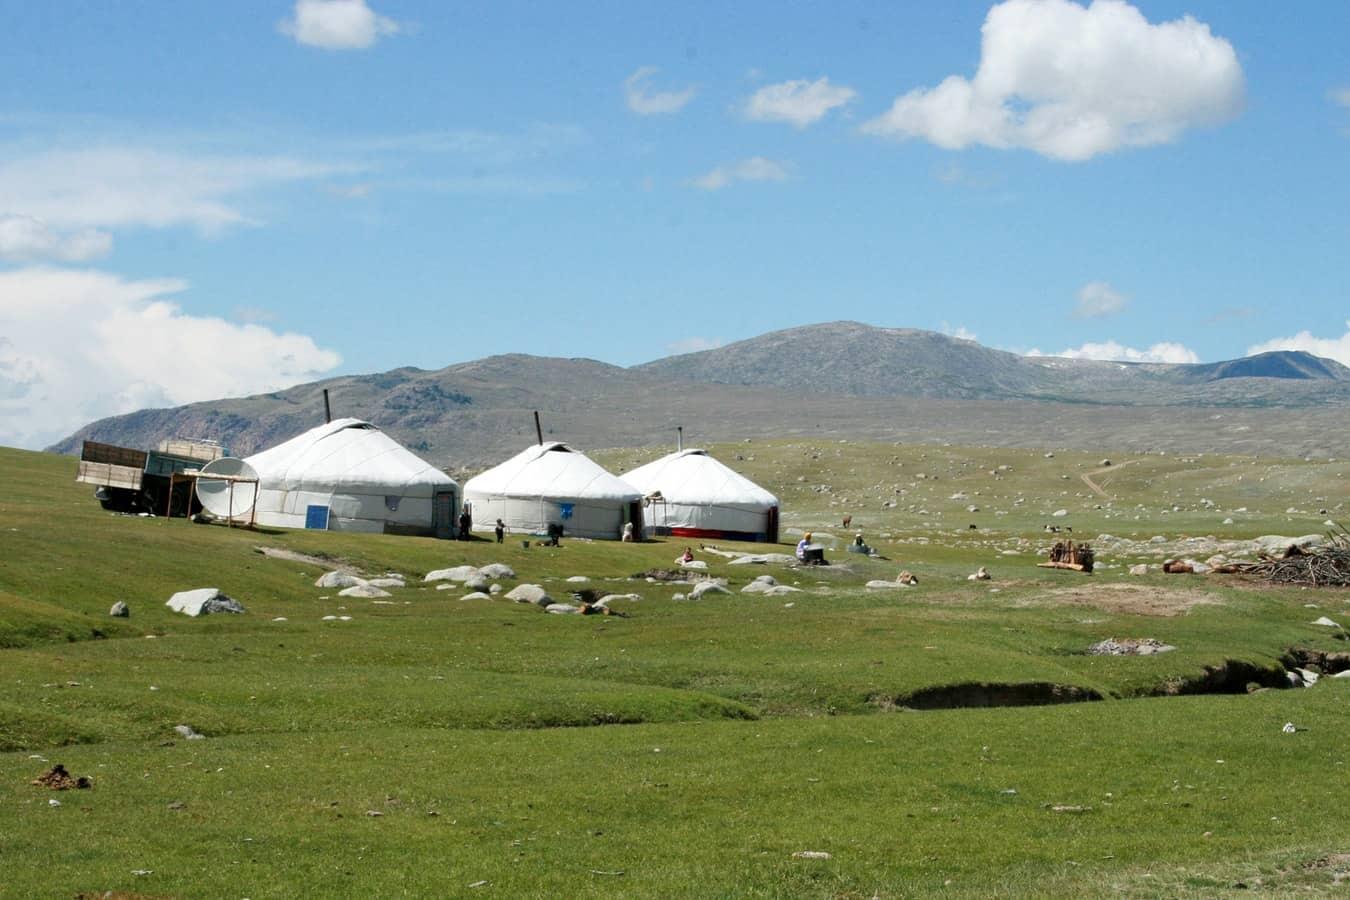 Row of yurts